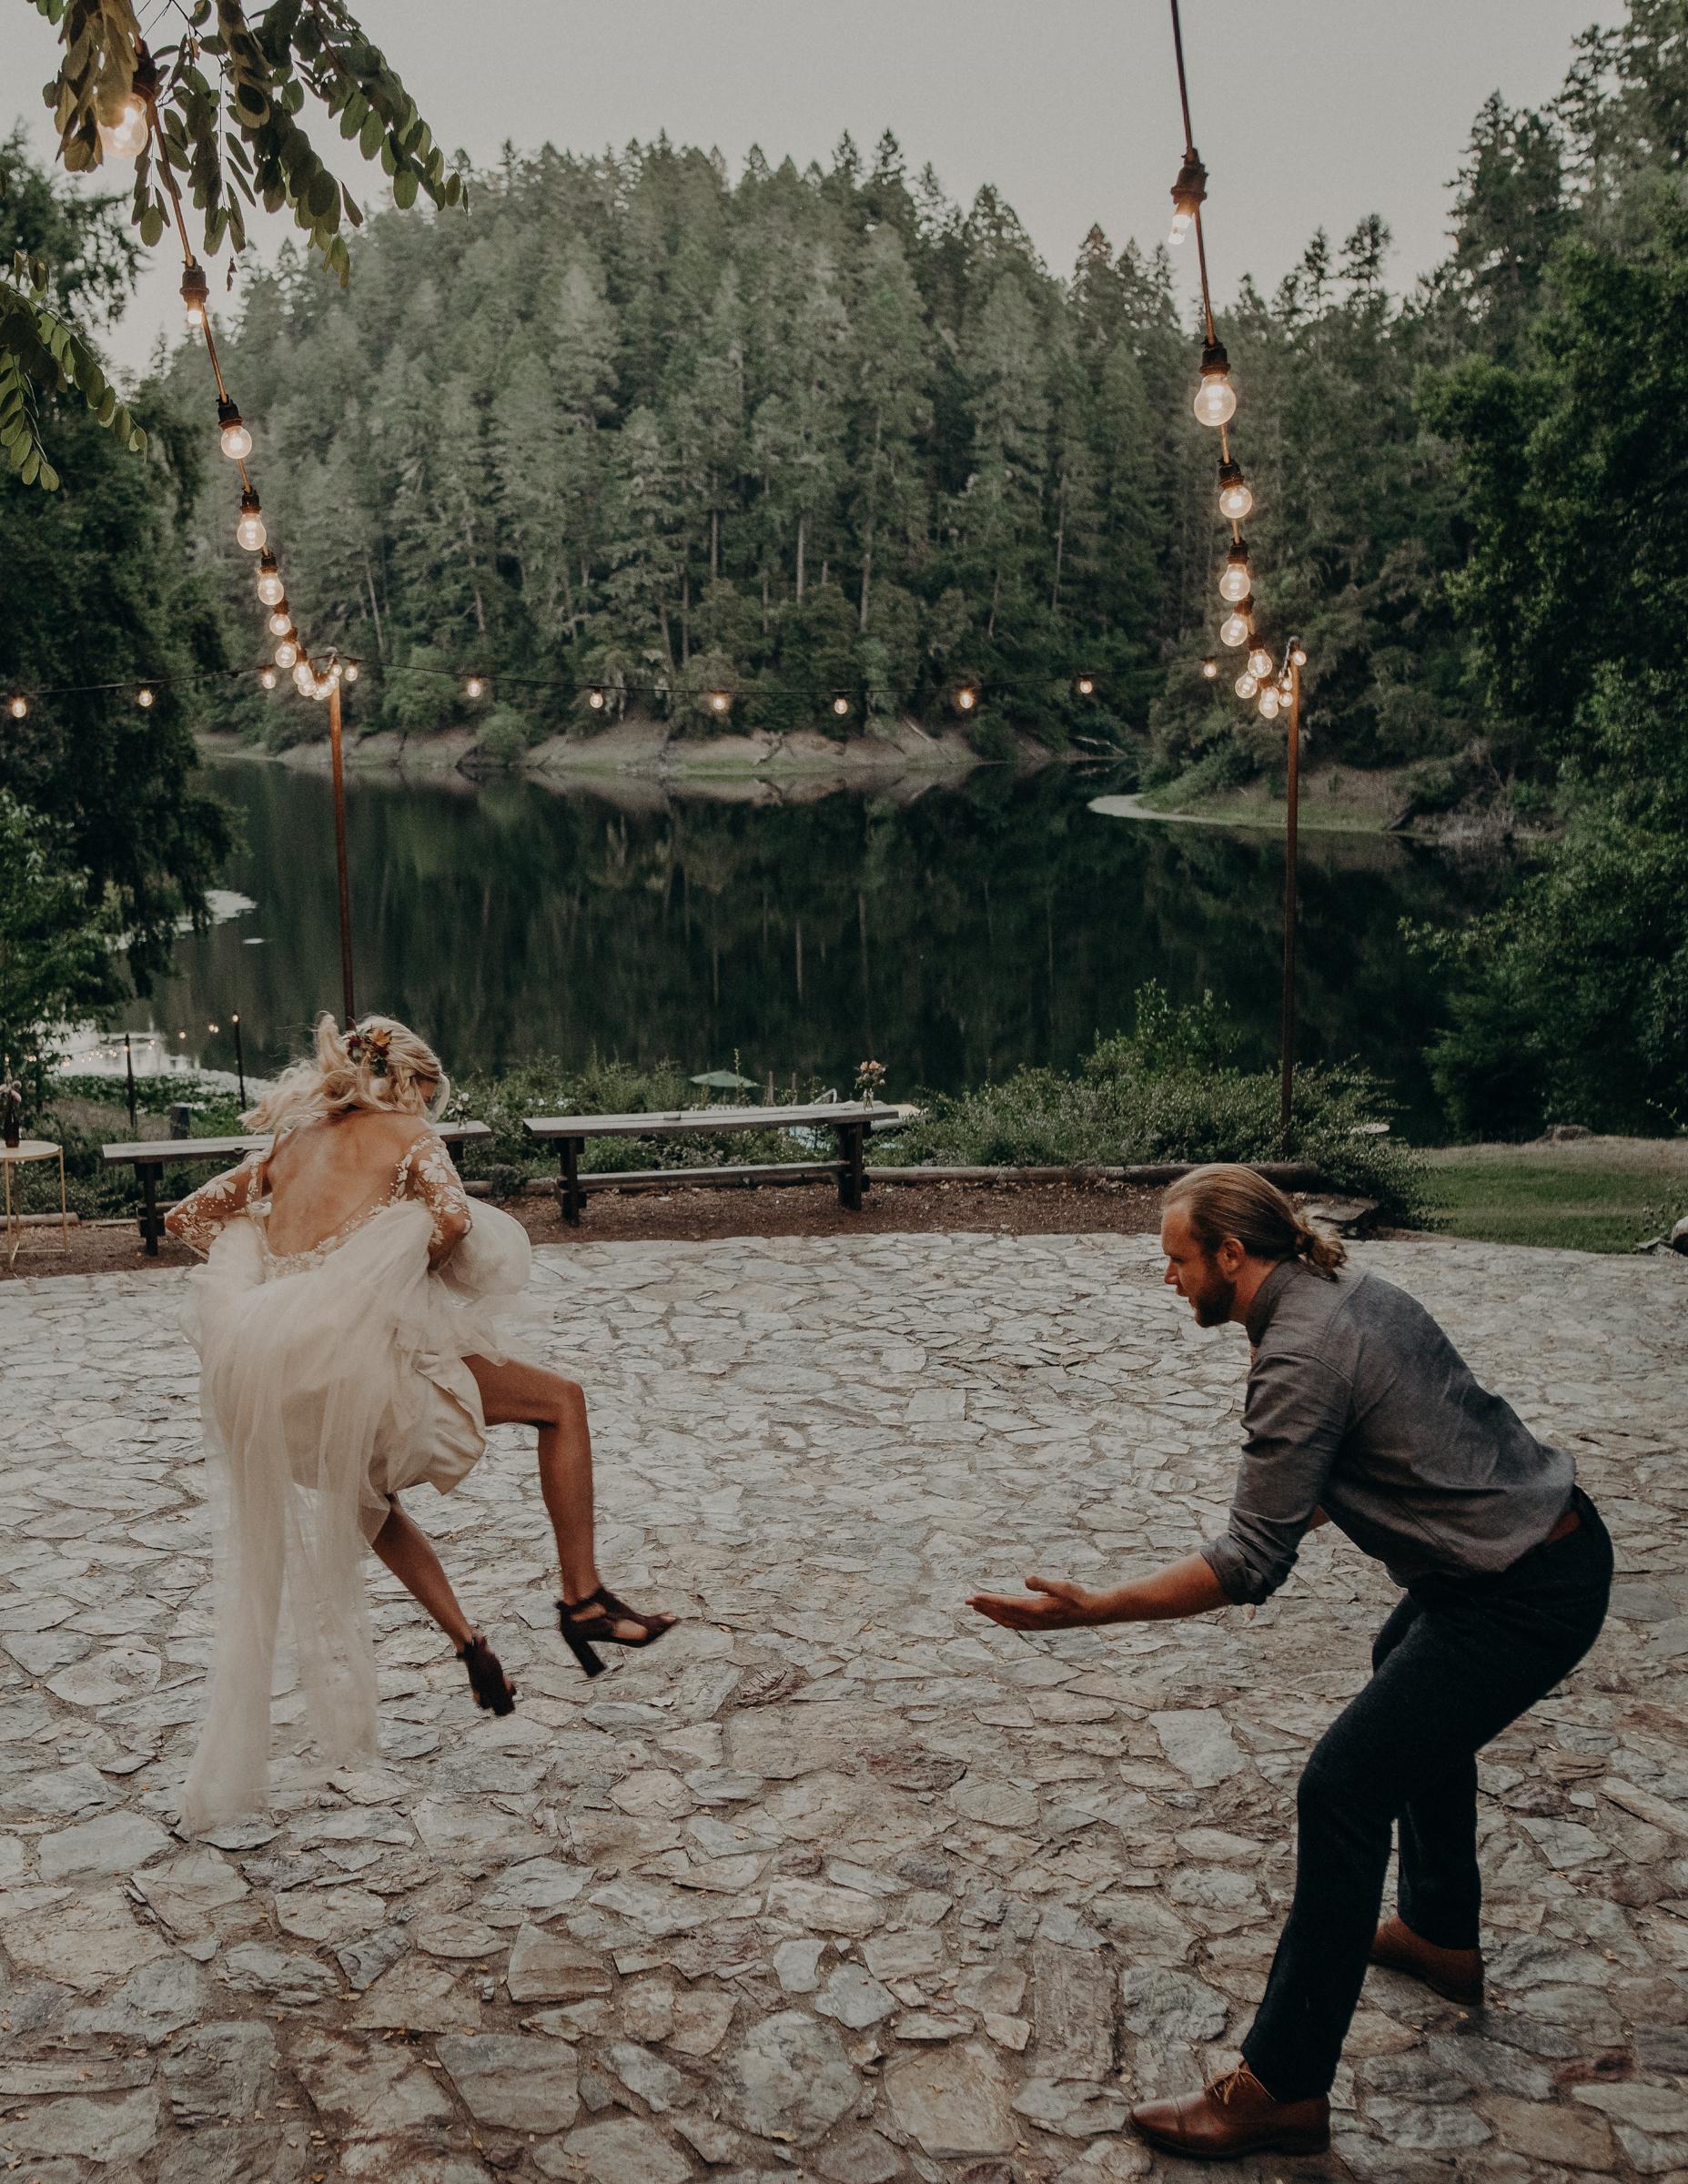 IsaiahAndTaylor.com - California Destination Elopement, Lake Leonard Reserve Wedding, Ukiah-196.jpg